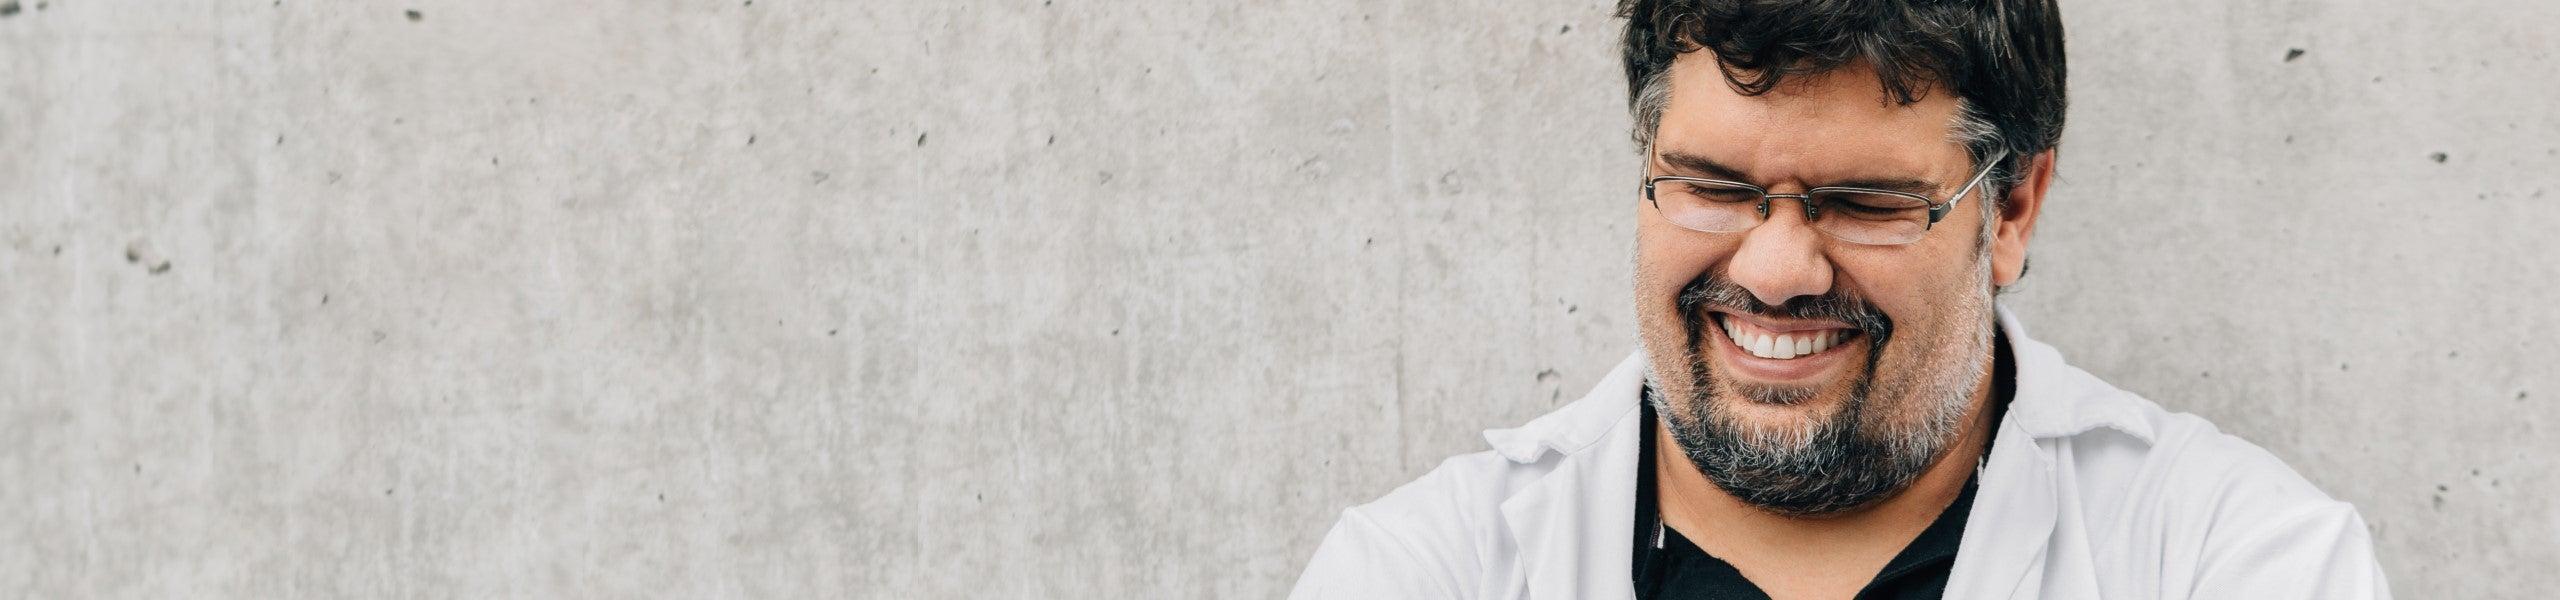 Man in white lab coat smiling